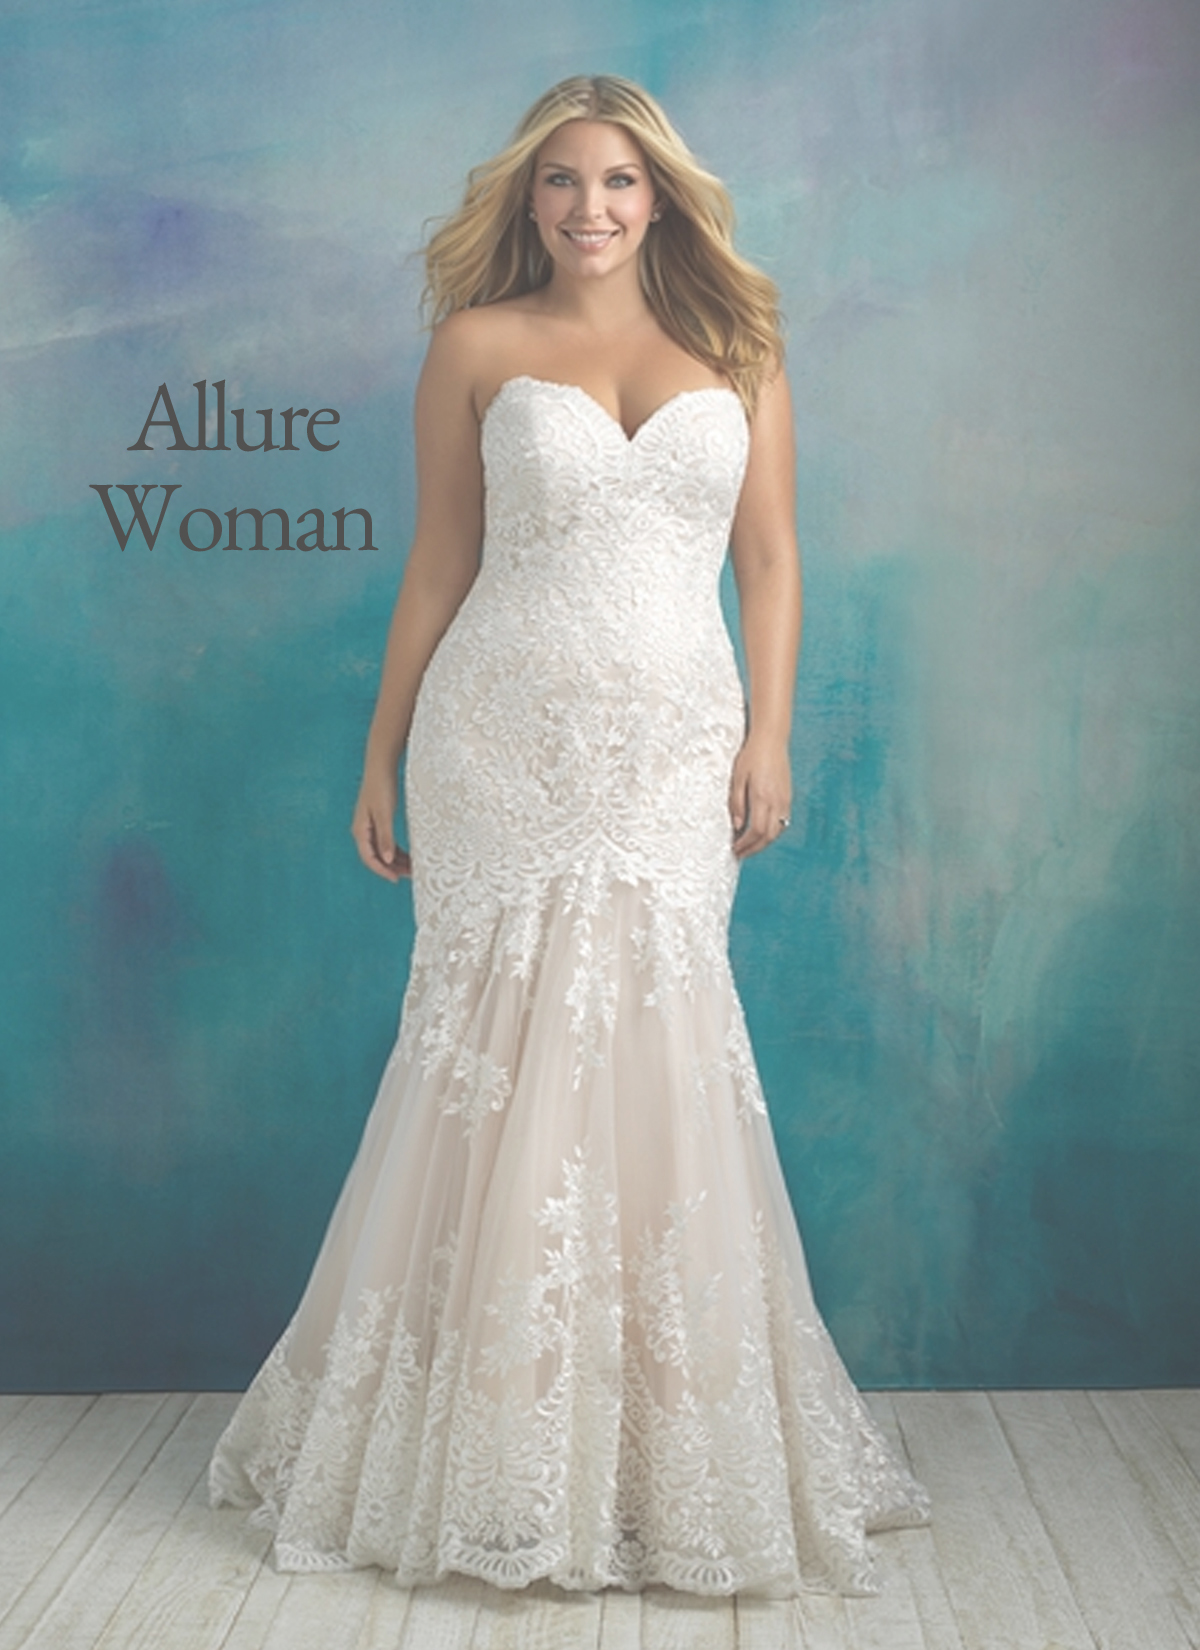 Bridal Gowns in Melbourne FL | (321) 373-1002 | Nicole Maree Bridal